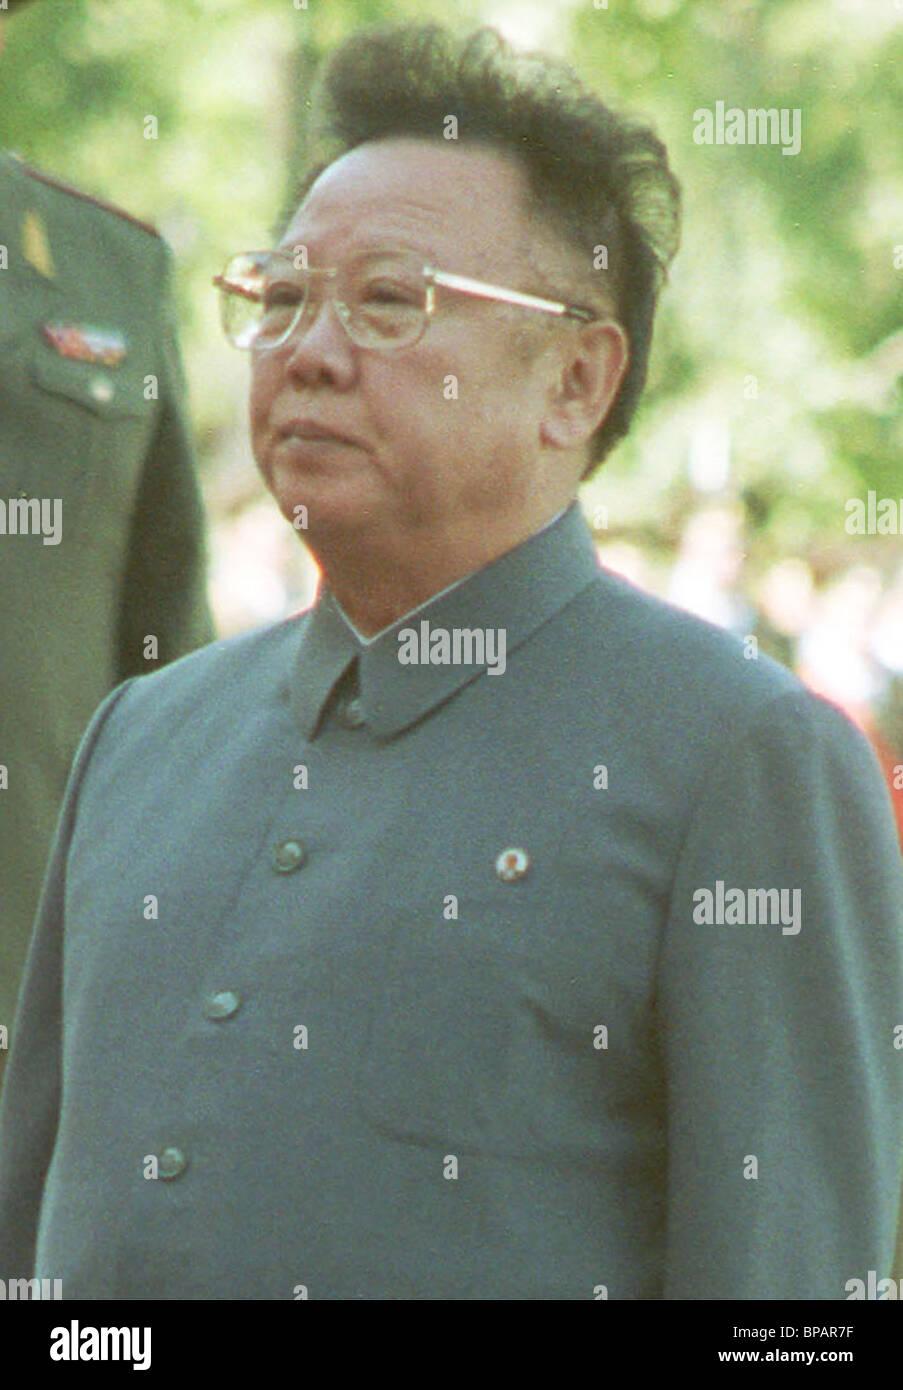 North Korean leader Kim Jong-il - Stock Image